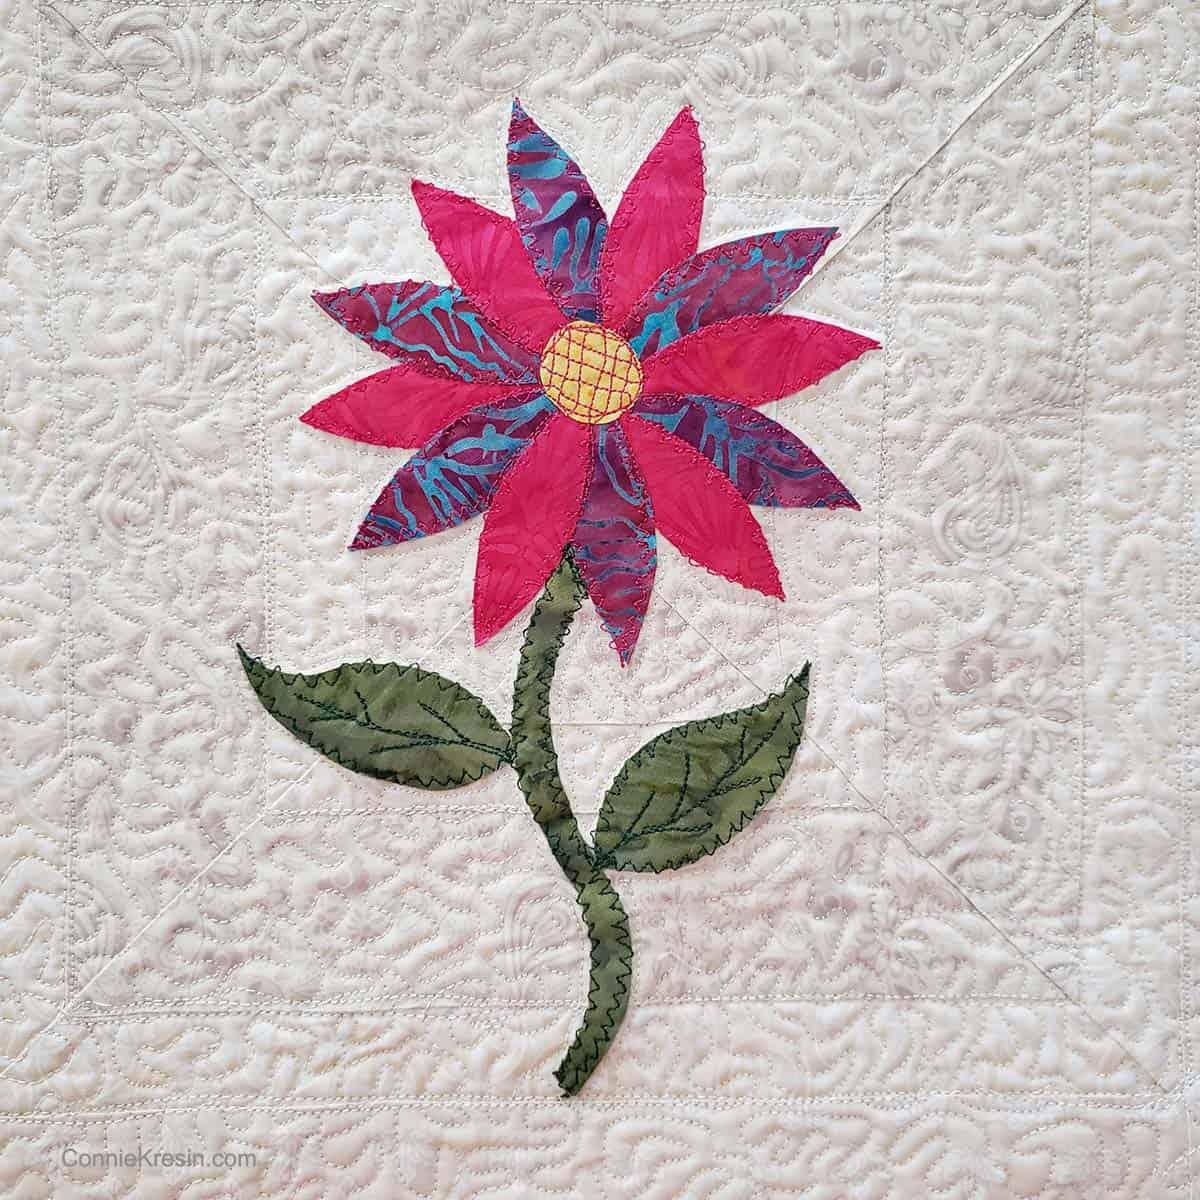 Closeup of the appliqued flower design